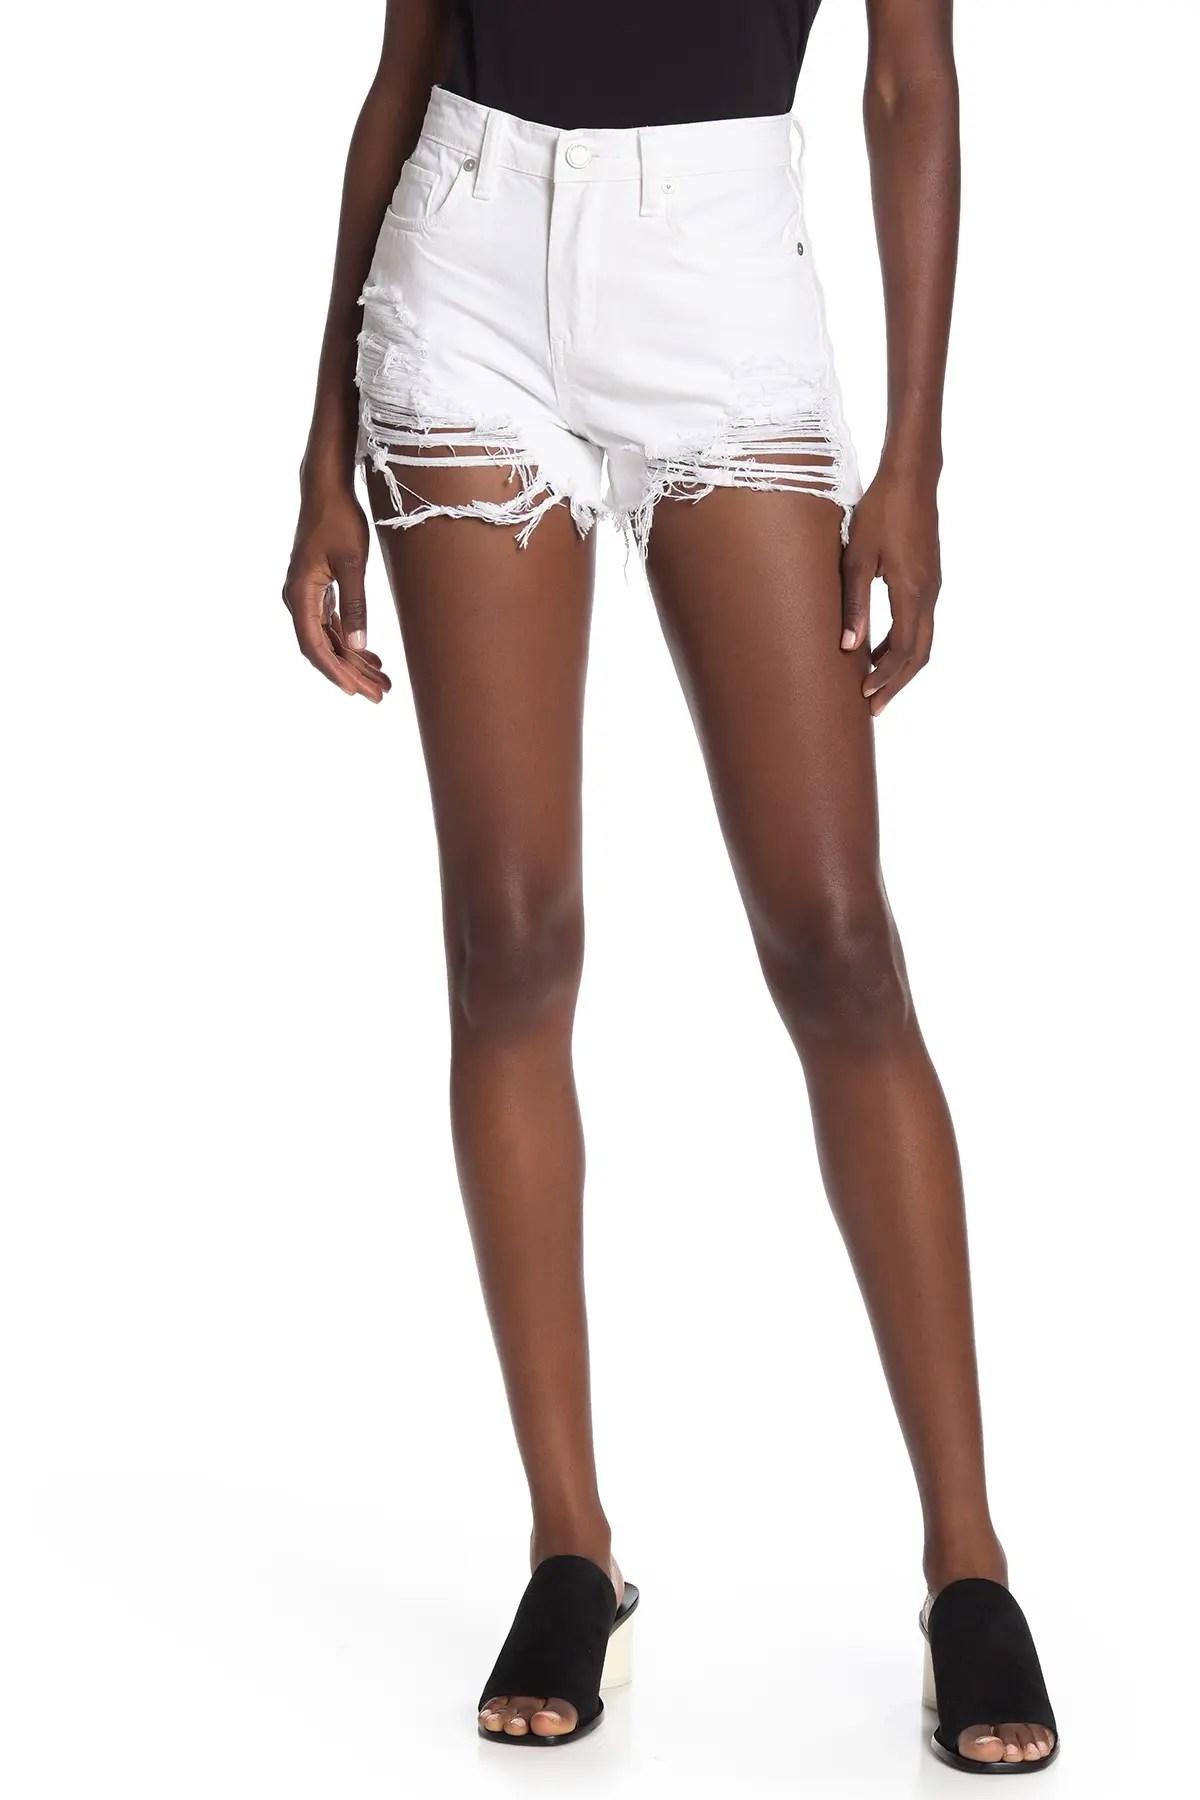 blanknyc denim high waist distressed denim shorts nordstrom rack